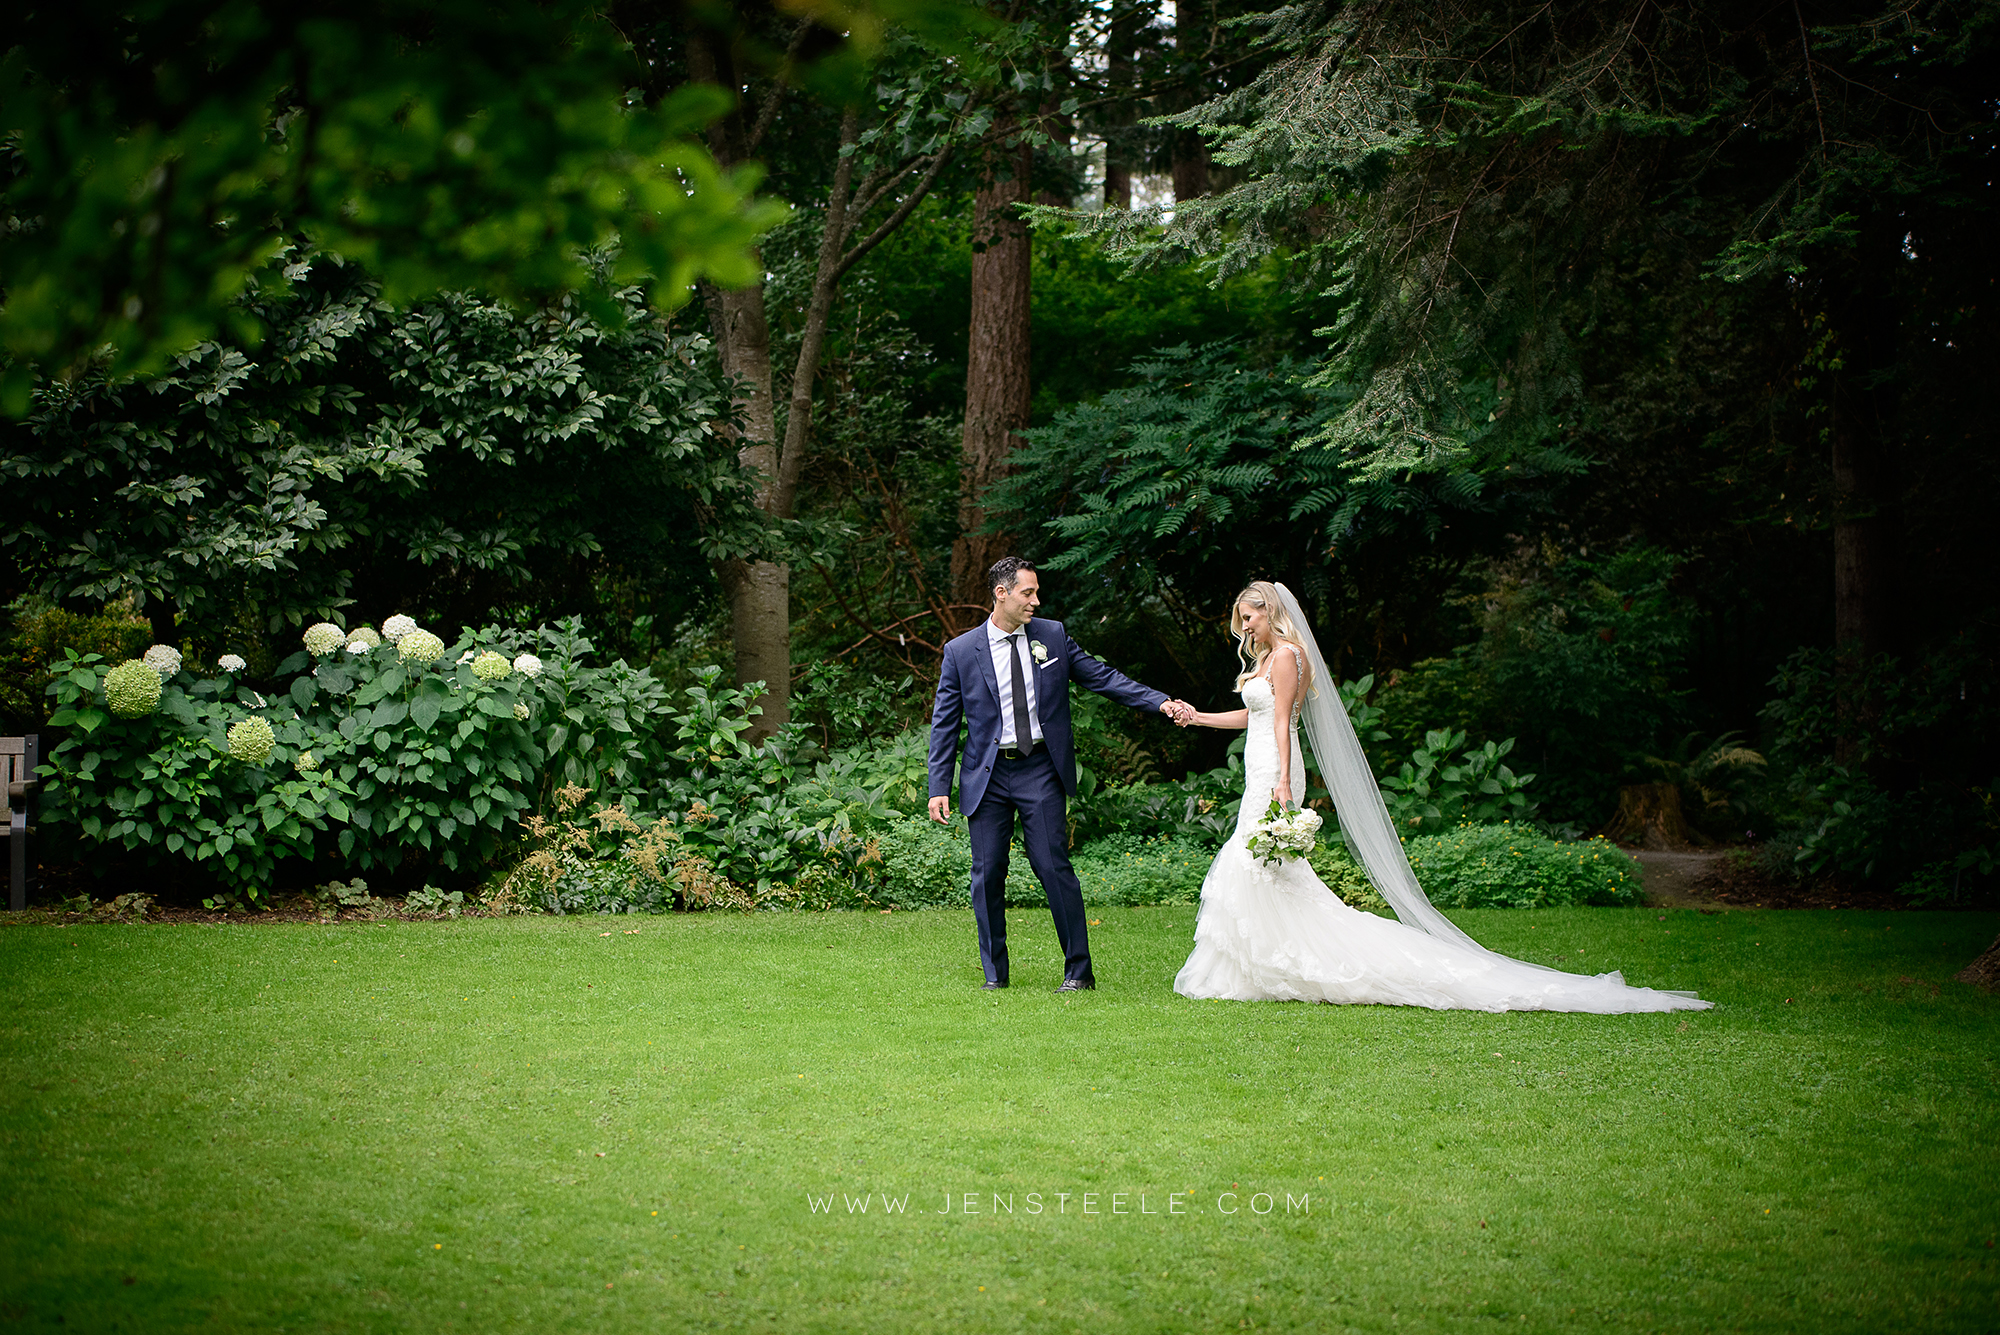 OAK-BAY-BEACH-HOTEL-WEDDING-PHOTOGRAPHERS-VICTORIA-BC-JENSTEELE